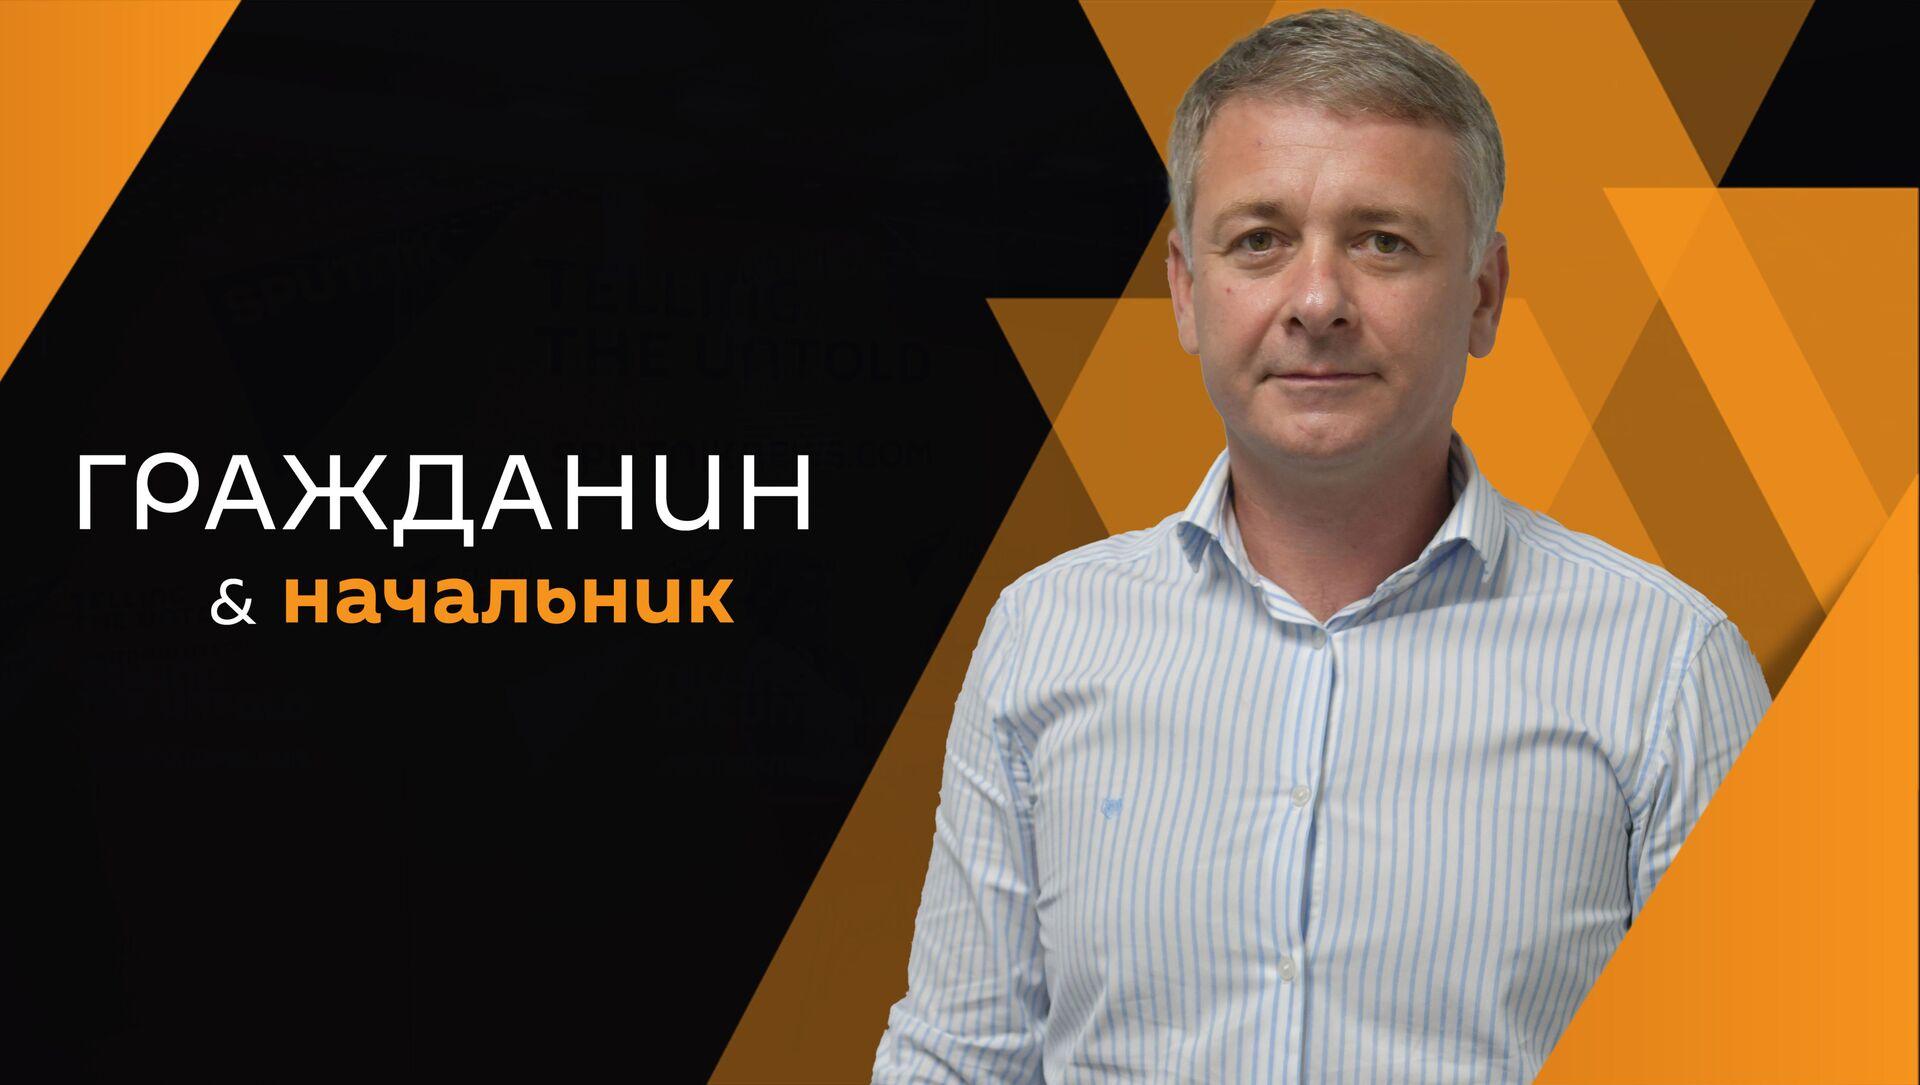 Дмитрий Хагуш - Sputnik Абхазия, 1920, 29.07.2021